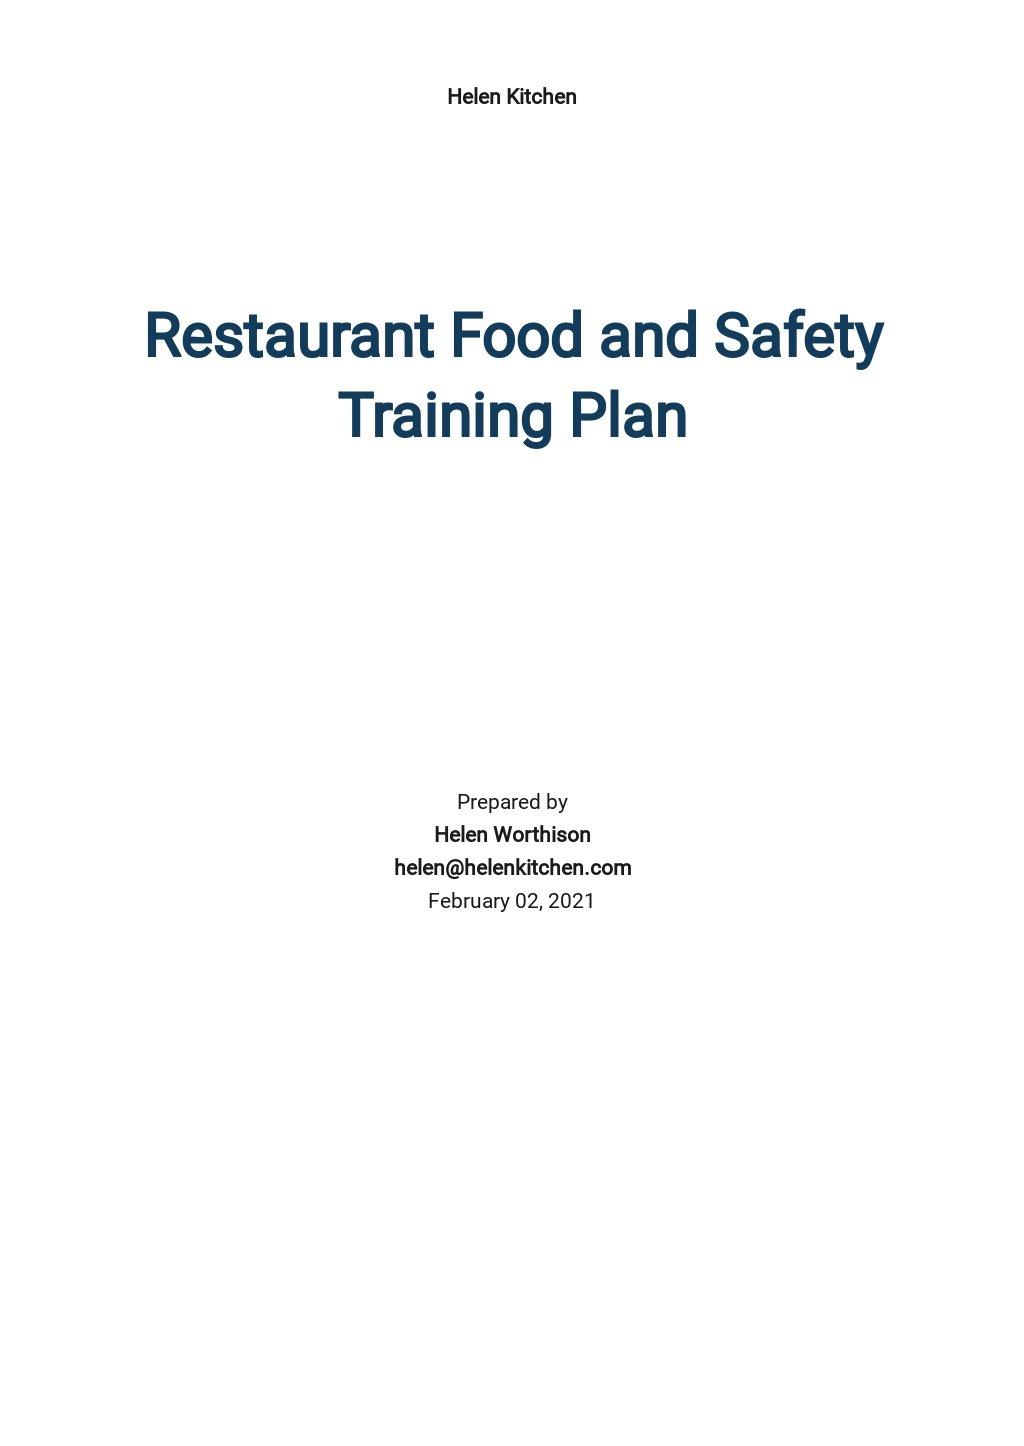 Annual Training Plan Template.jpe